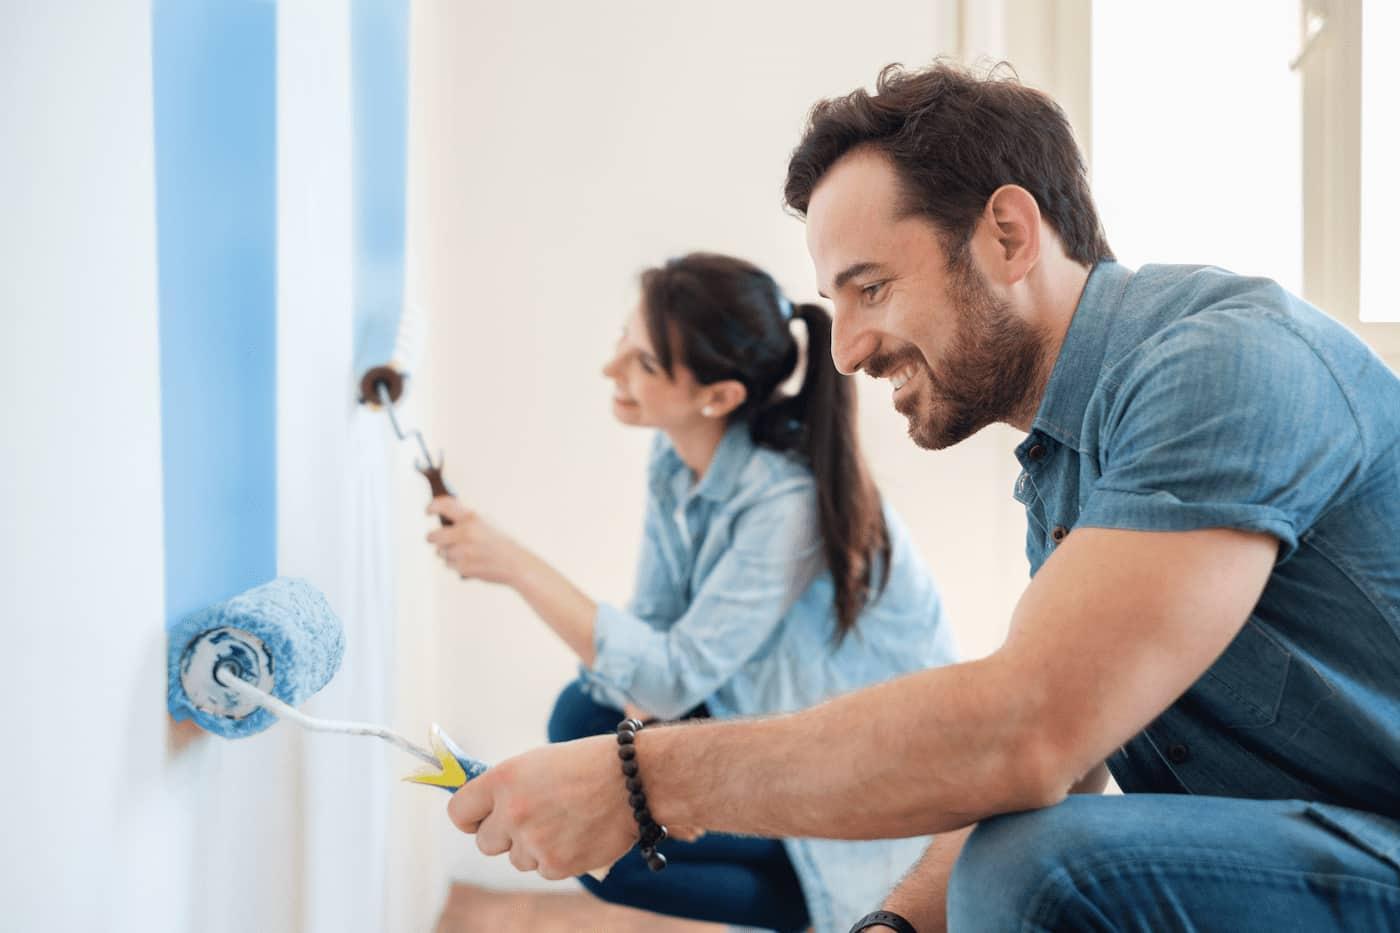 Leasing season rental property preparation